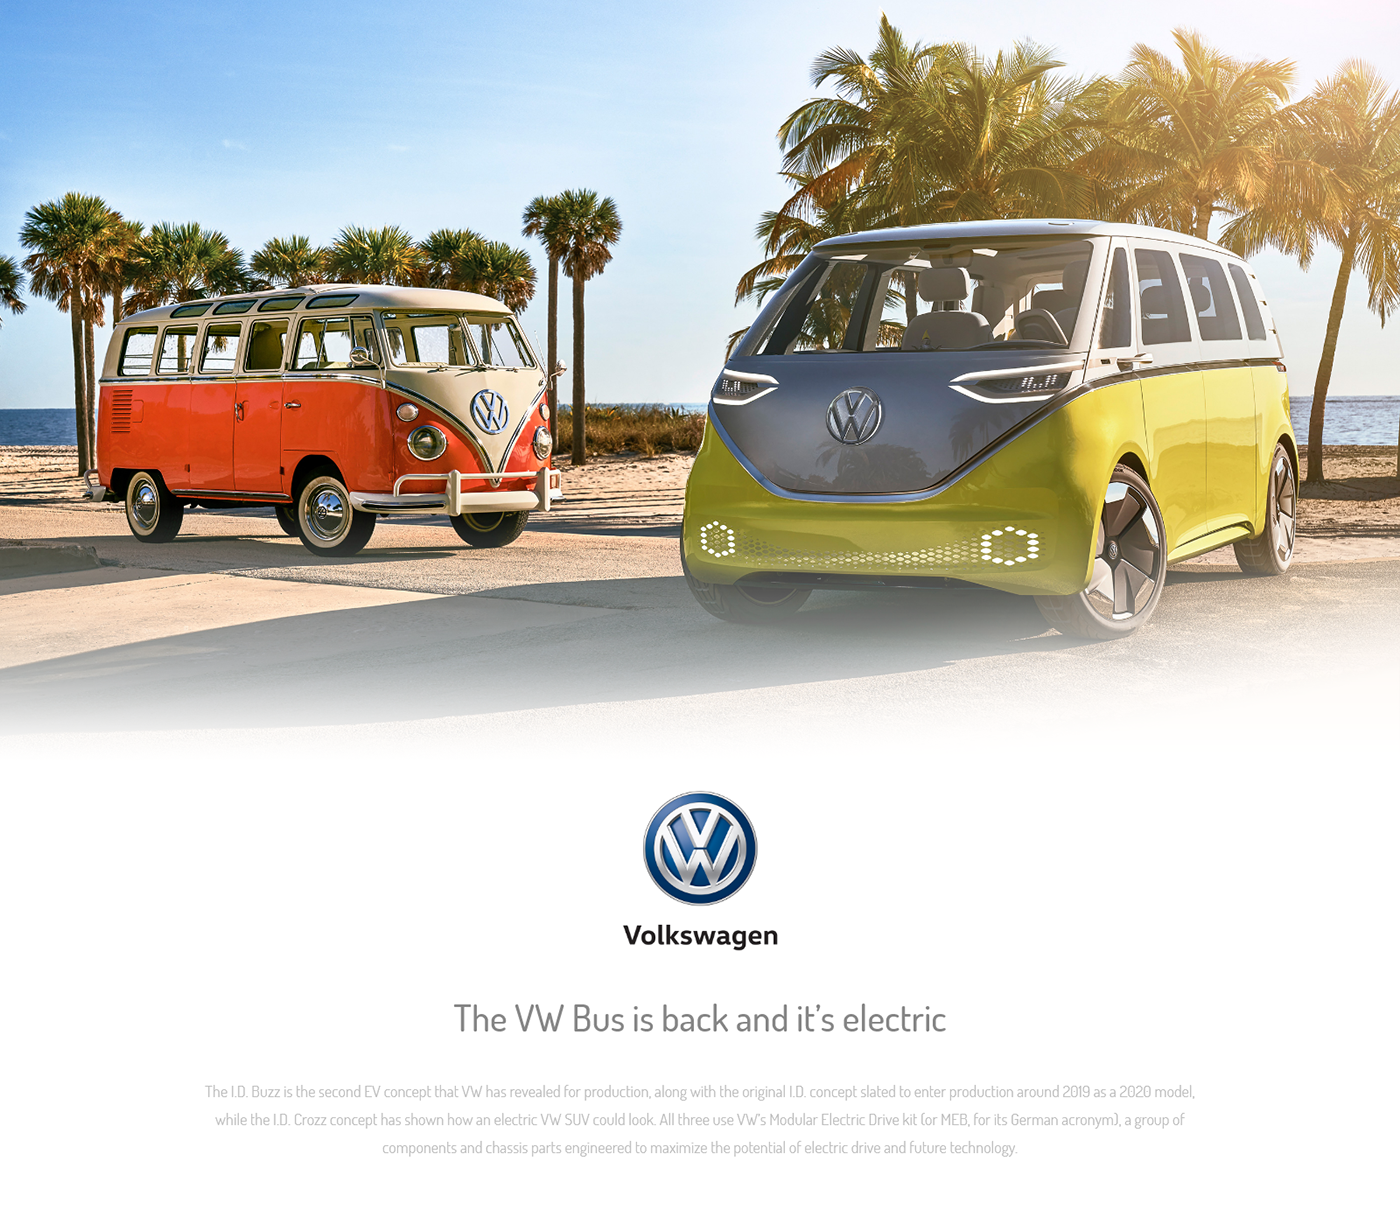 Volkswagen The Vw Bus Landing Page Design On Behance